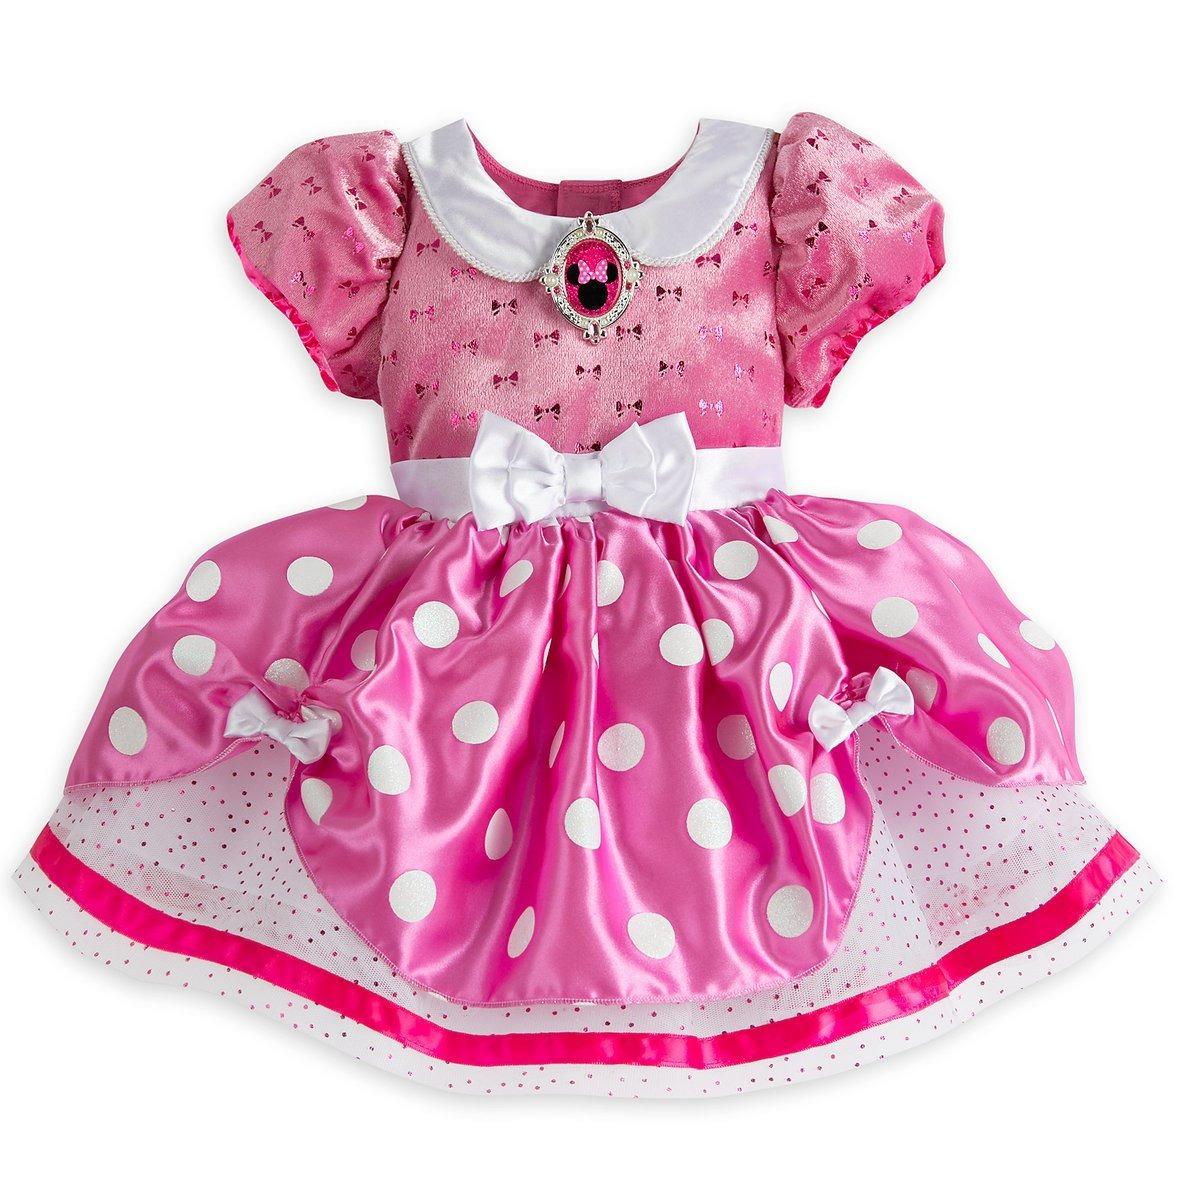 1fcbb3ce7a7 Disfraz De Mimi   Minnie Mouse Original Disney Store -   1